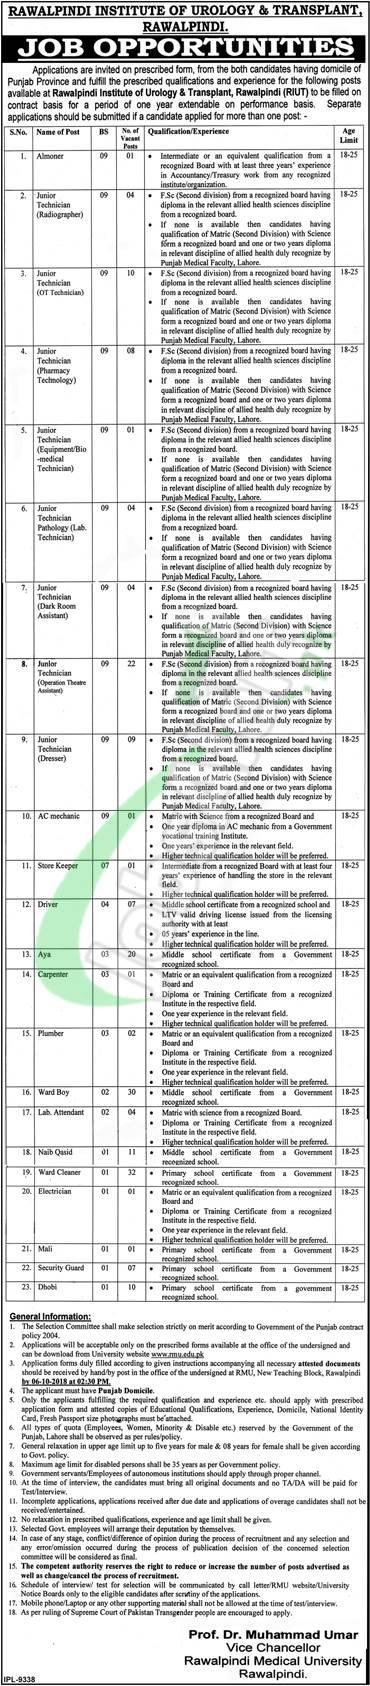 Institute of Urology and Transplantation Rawalpindi Jobs